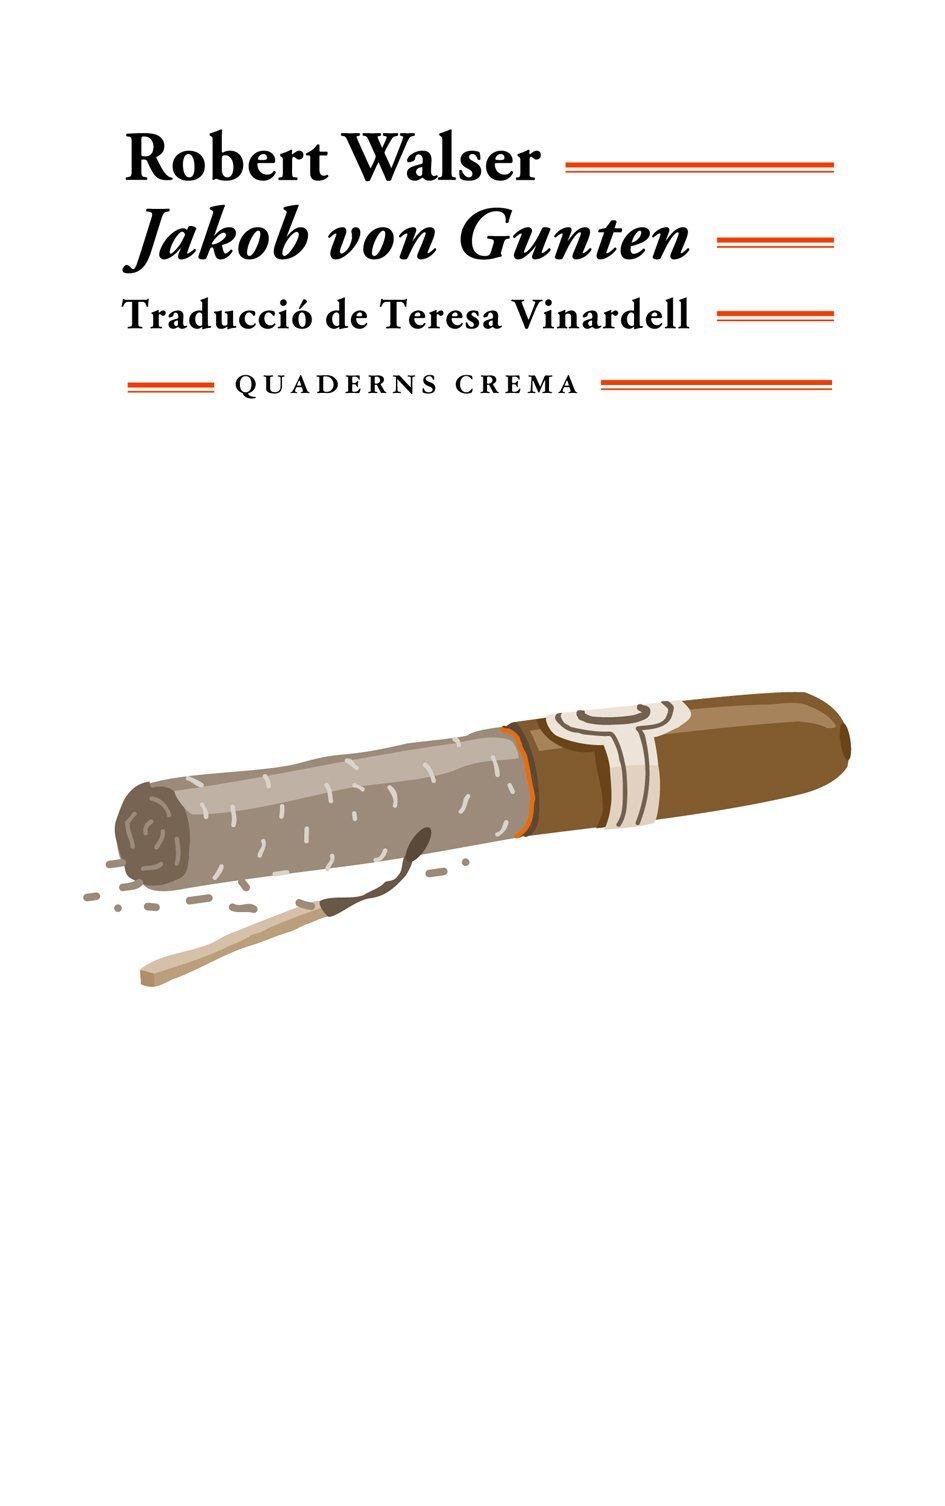 Jakob von Gunten. Un dietari (Biblioteca Mínima) (Catalán) Tapa blanda – 1 ene 1999 Robert Walser Teresa Vinardell Puig Quaderns Crema 8477272786